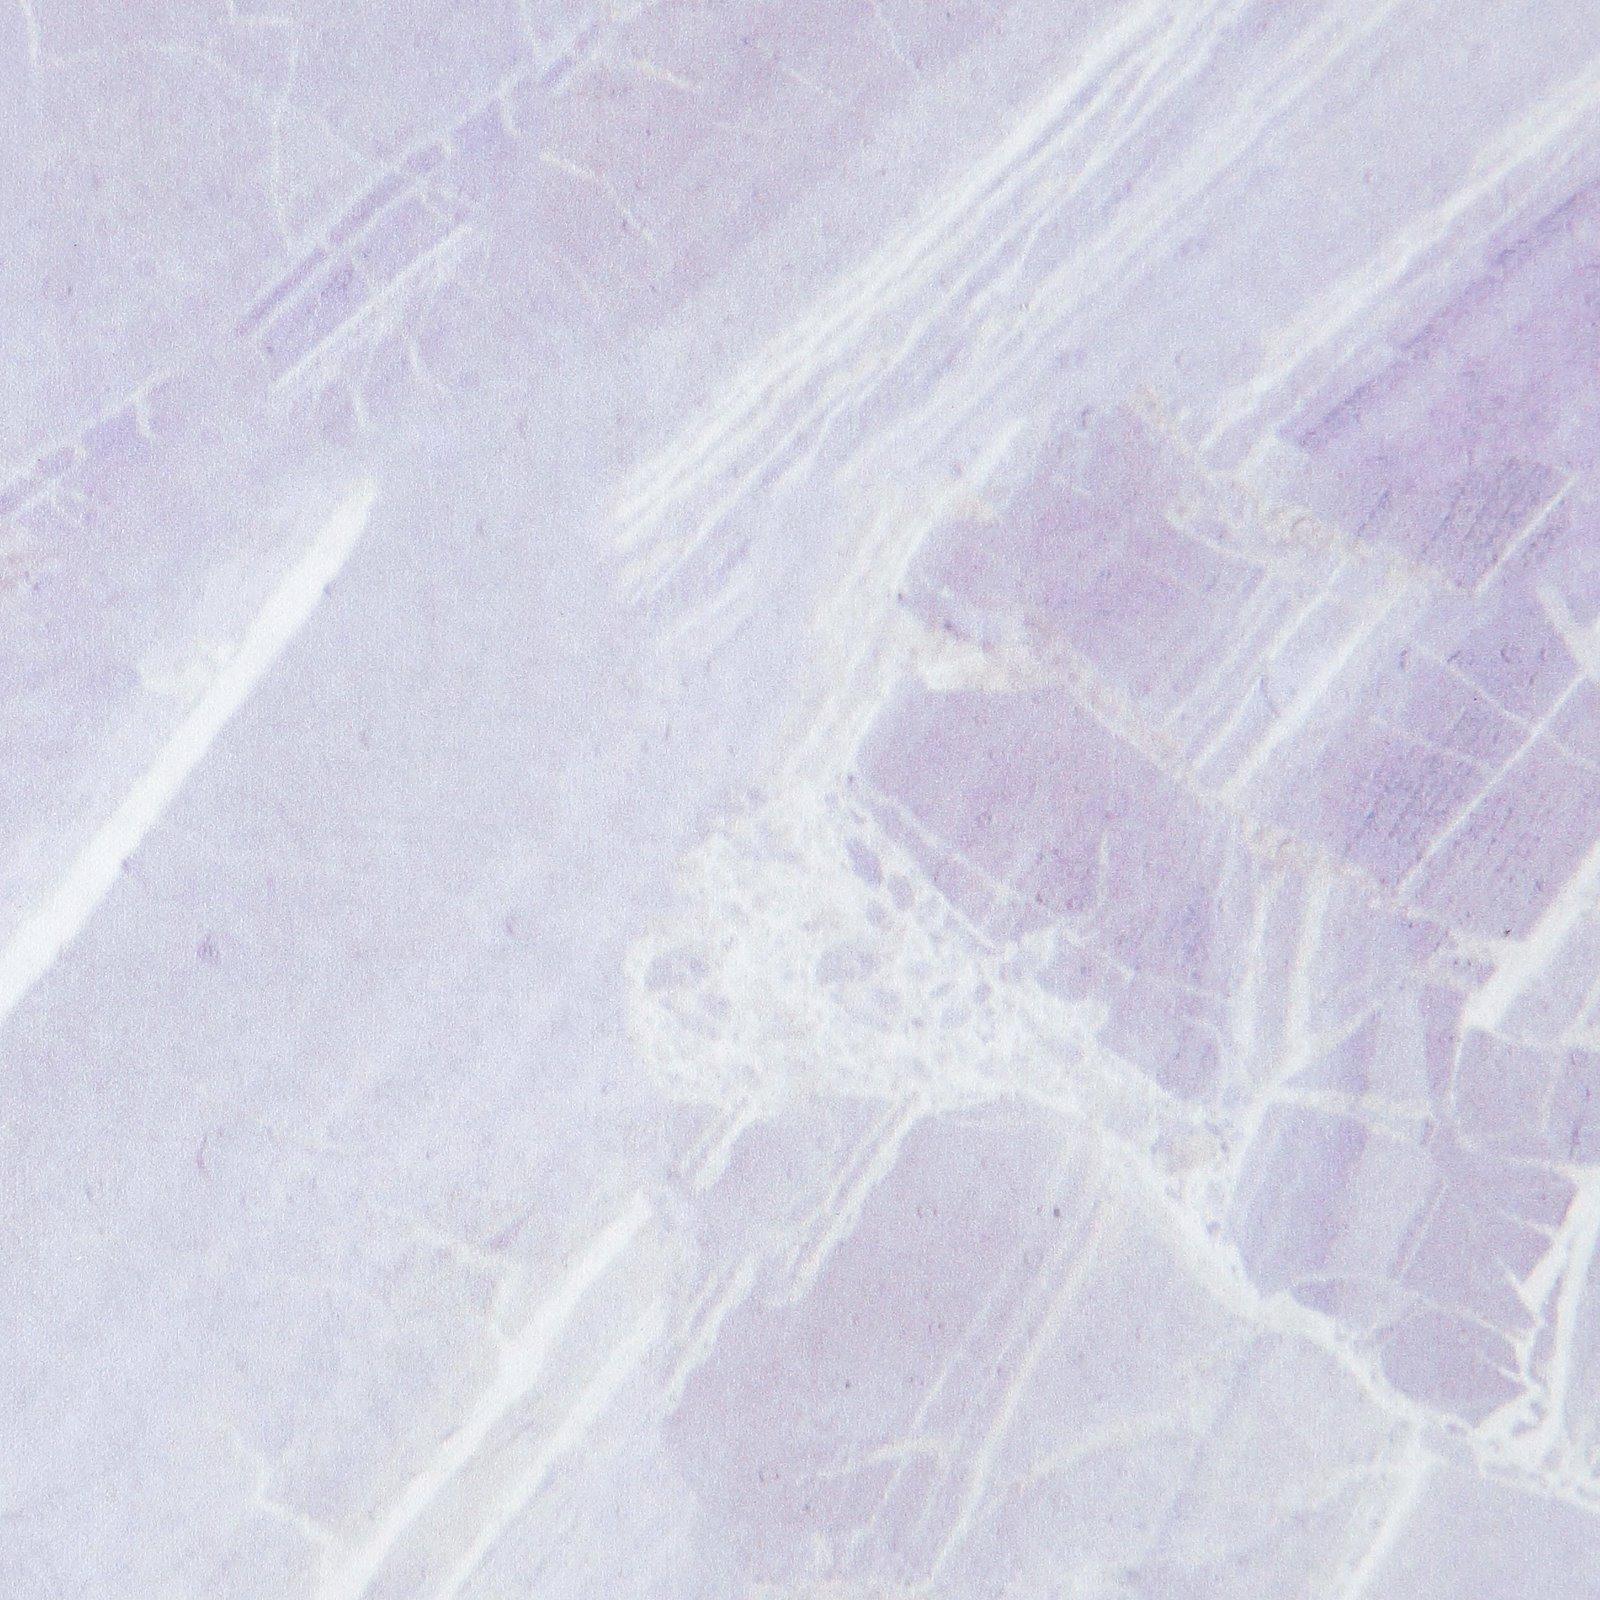 PAP FAB marble lavender 72x100cm 95513_pack_b